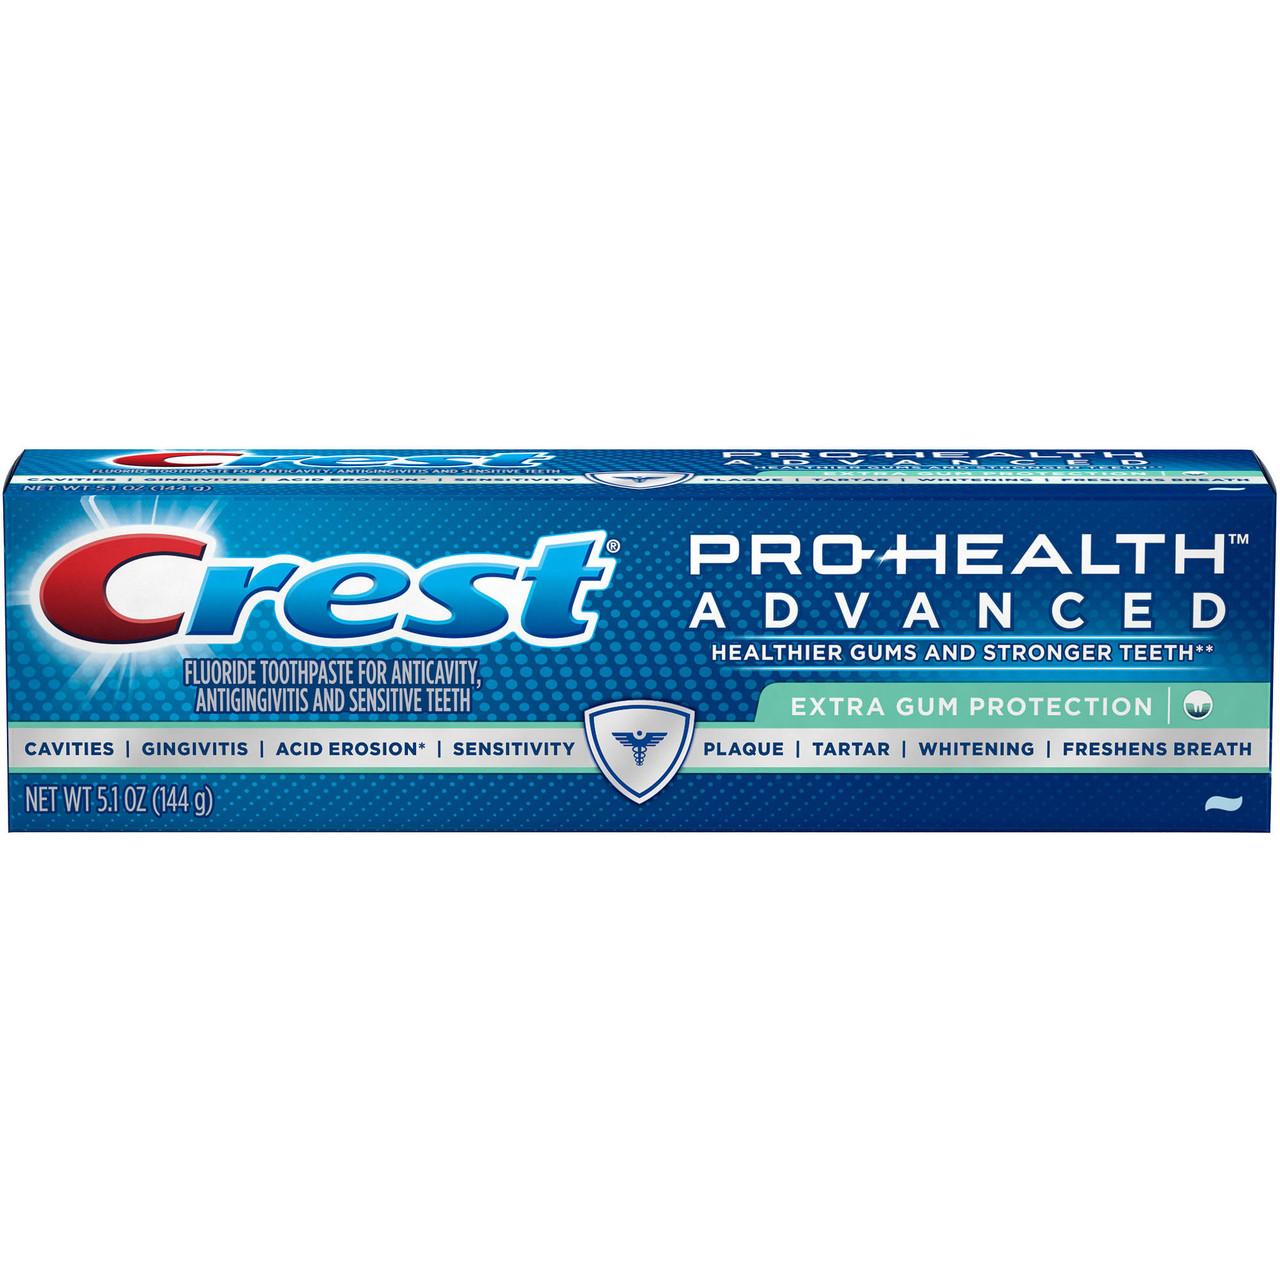 Crest Pro-Health Advanced Extra Gum Protection - Зубная паста, 144 г